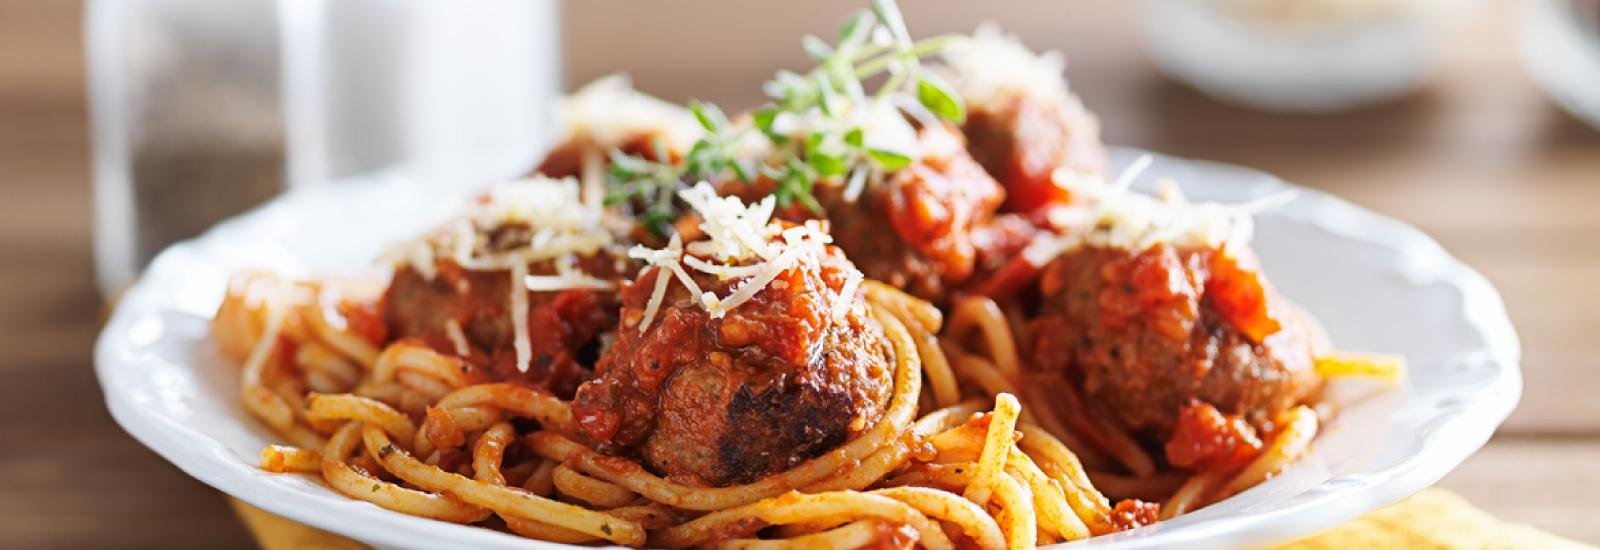 Italian Restaurants in Virginia Beach